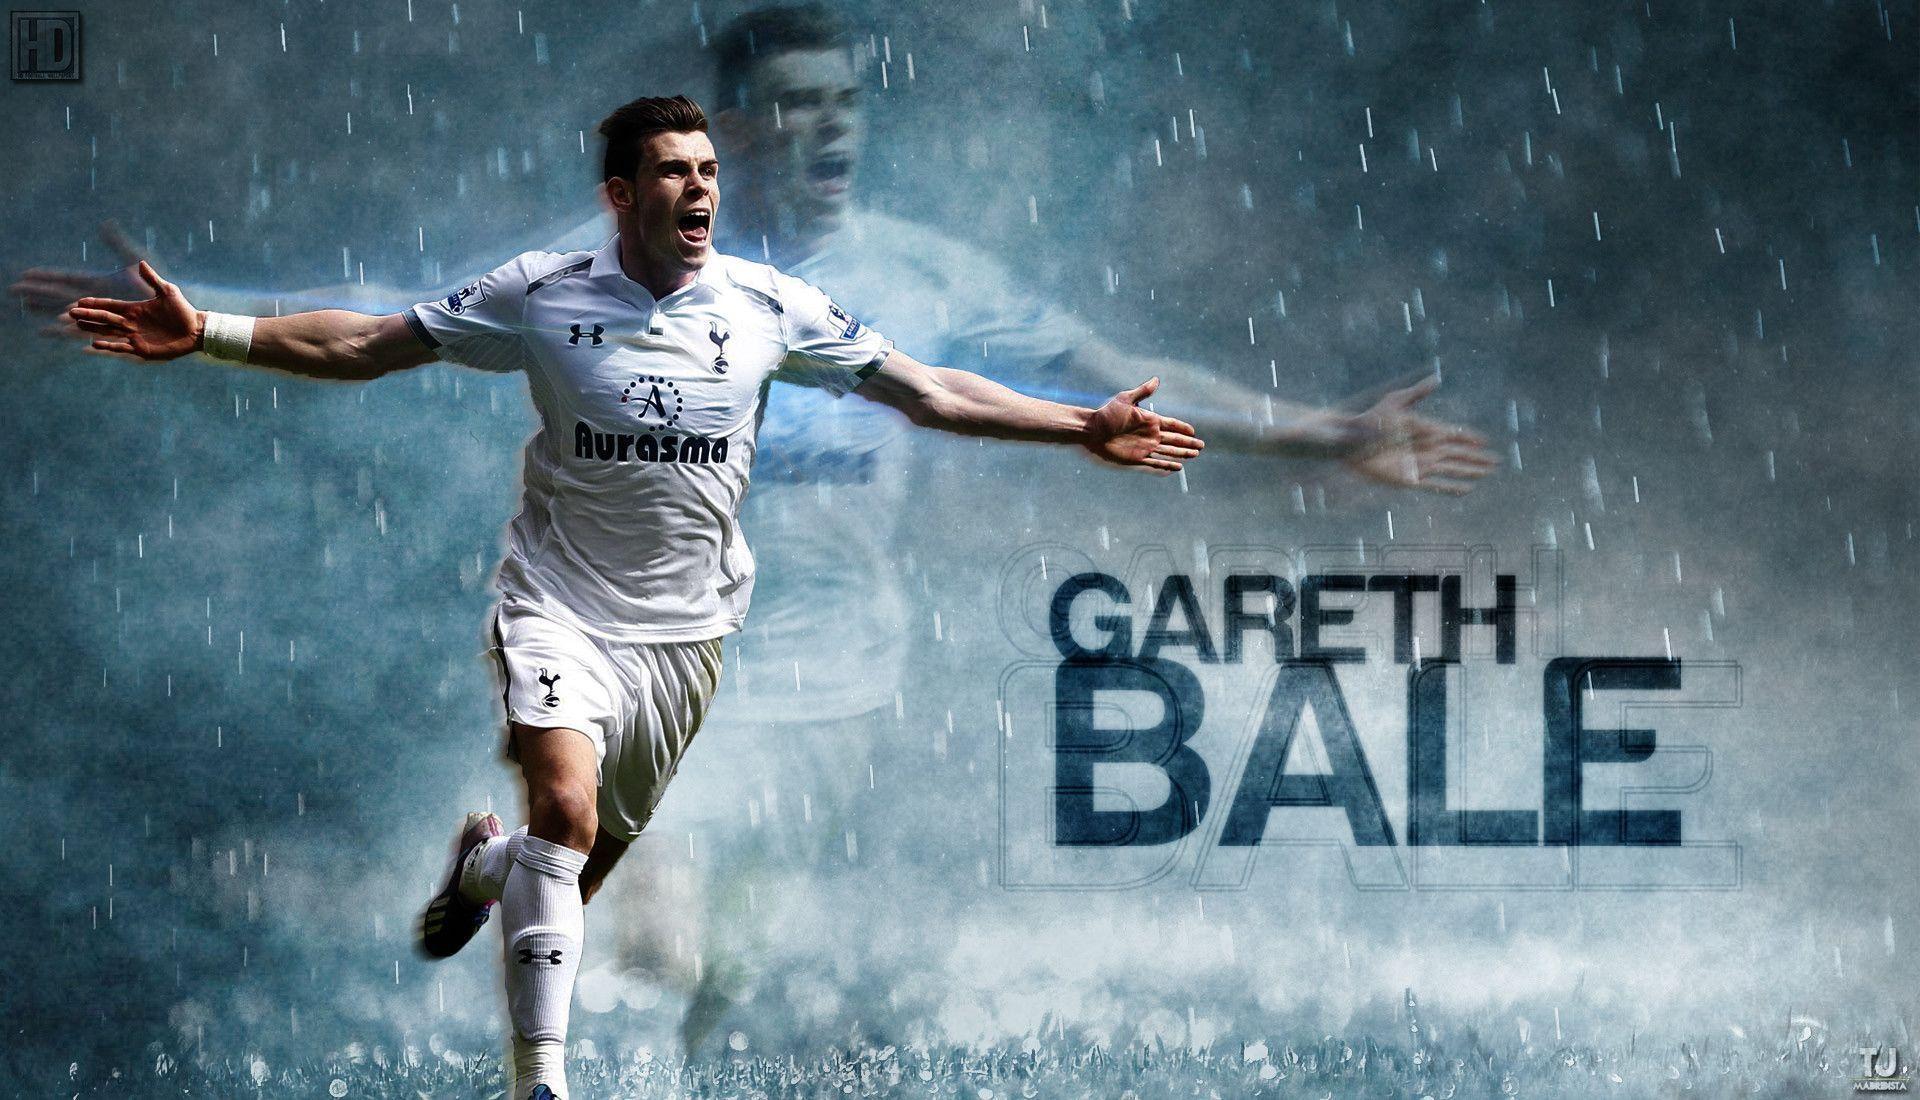 Gareth Bale - Highly Paid Footballer